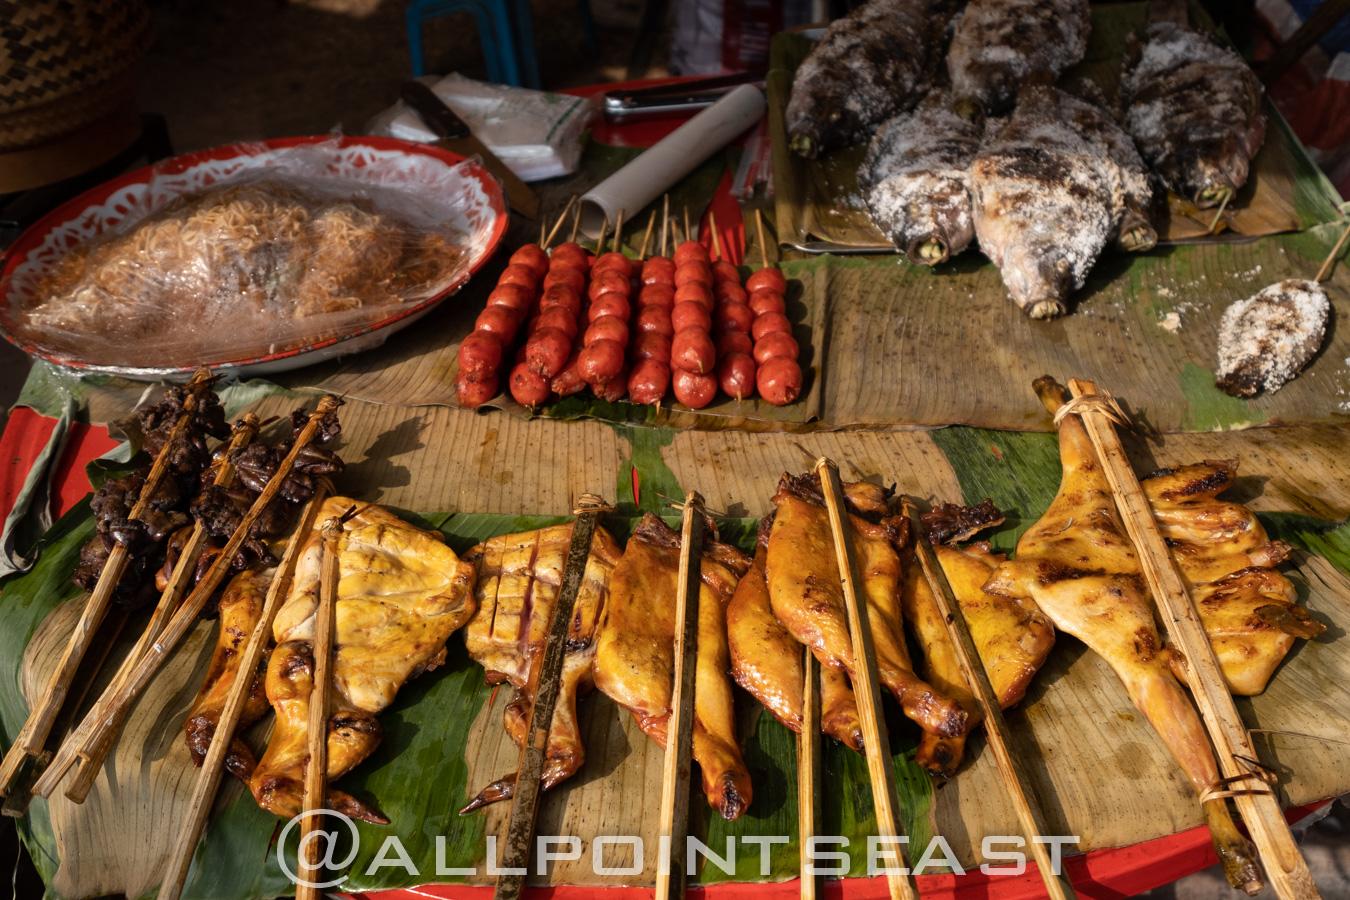 Laos, night market barbeque by Jeff Perigois